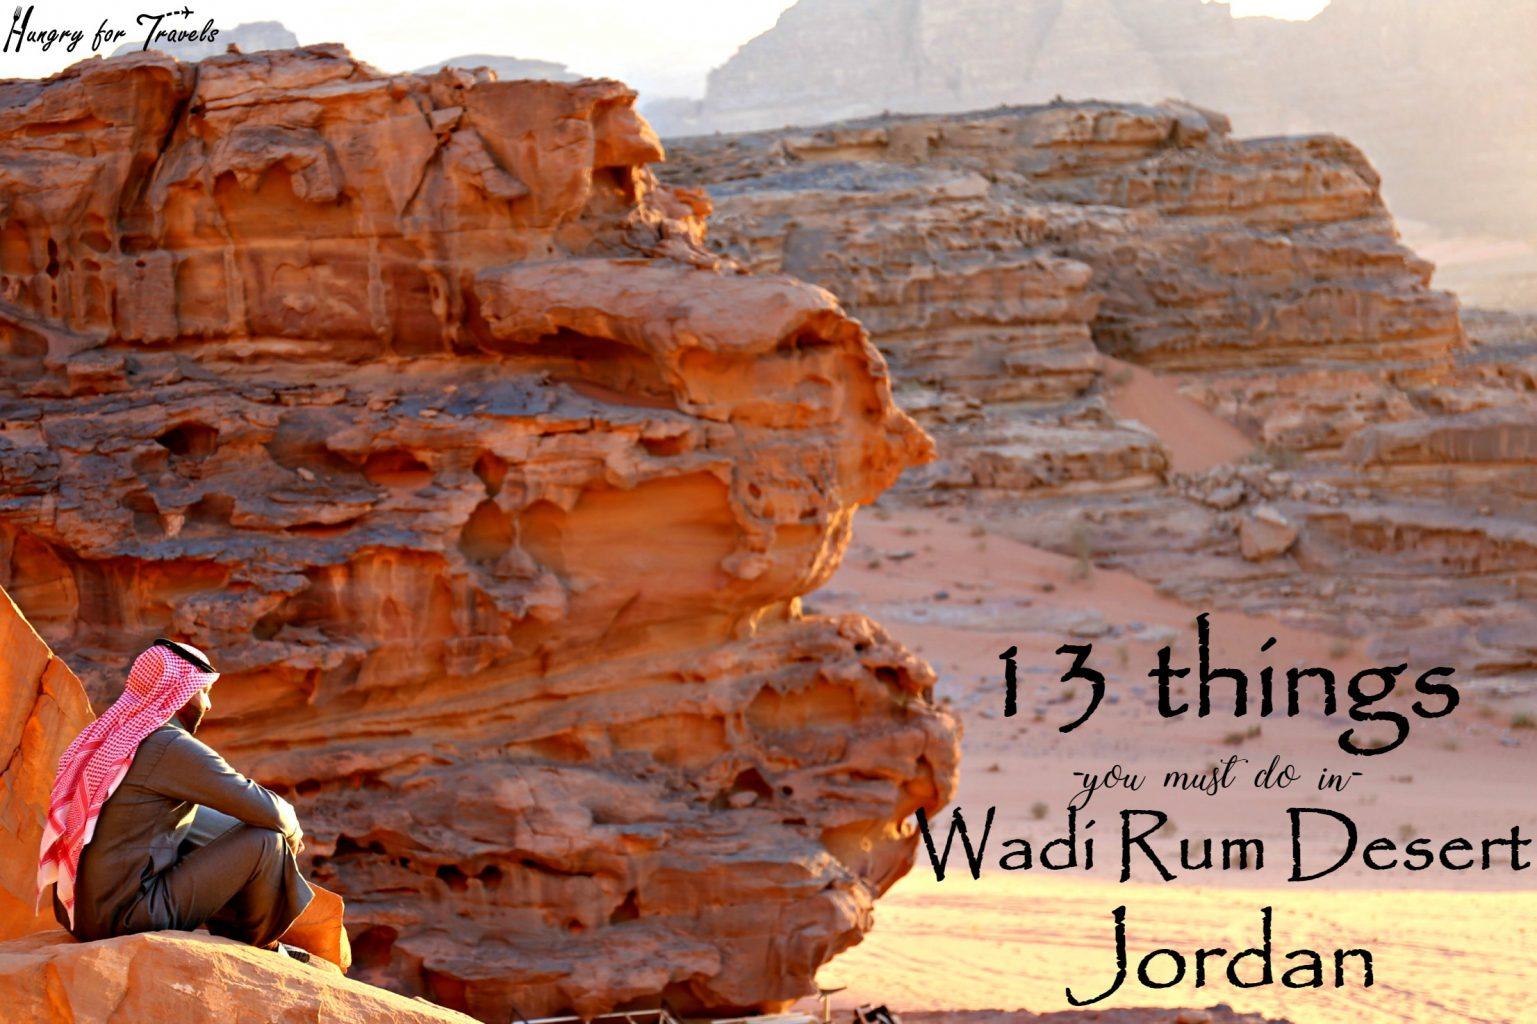 13 Things You Must Do In Wadi Rum Jordan | Hungry For